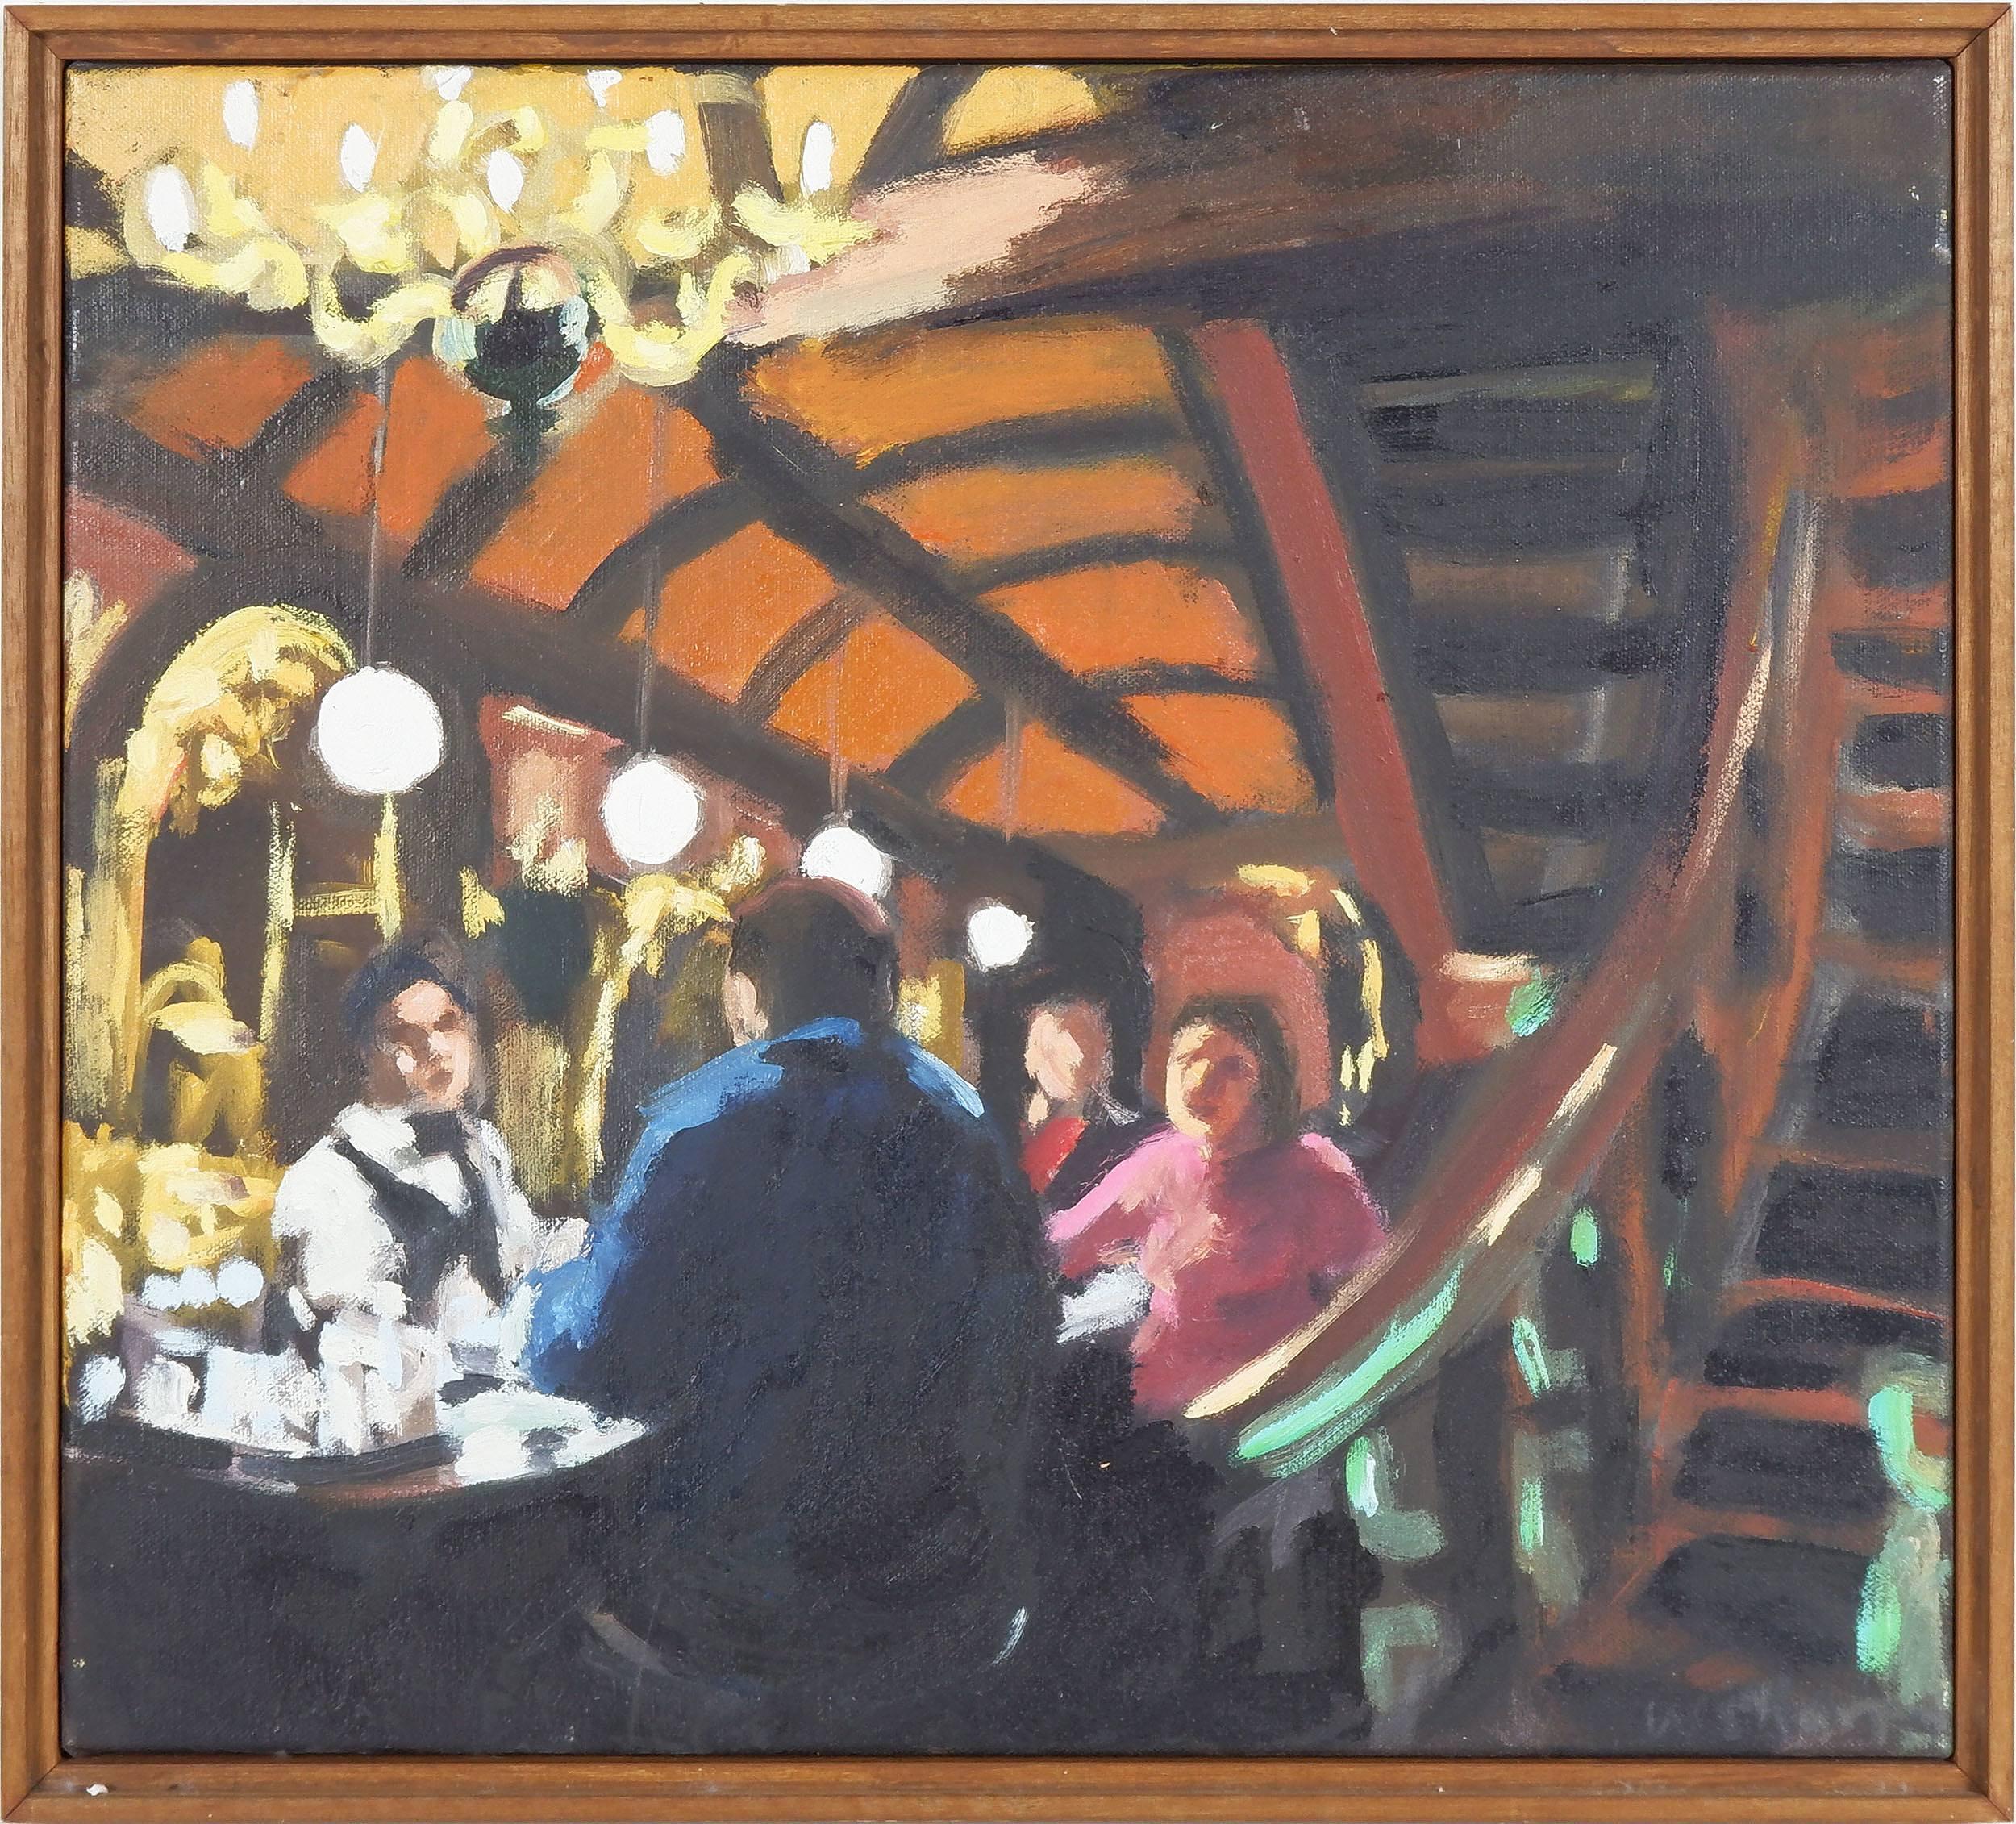 'Wendy Sharpe (1960-) Spanish Bar, Oil on Canvas'